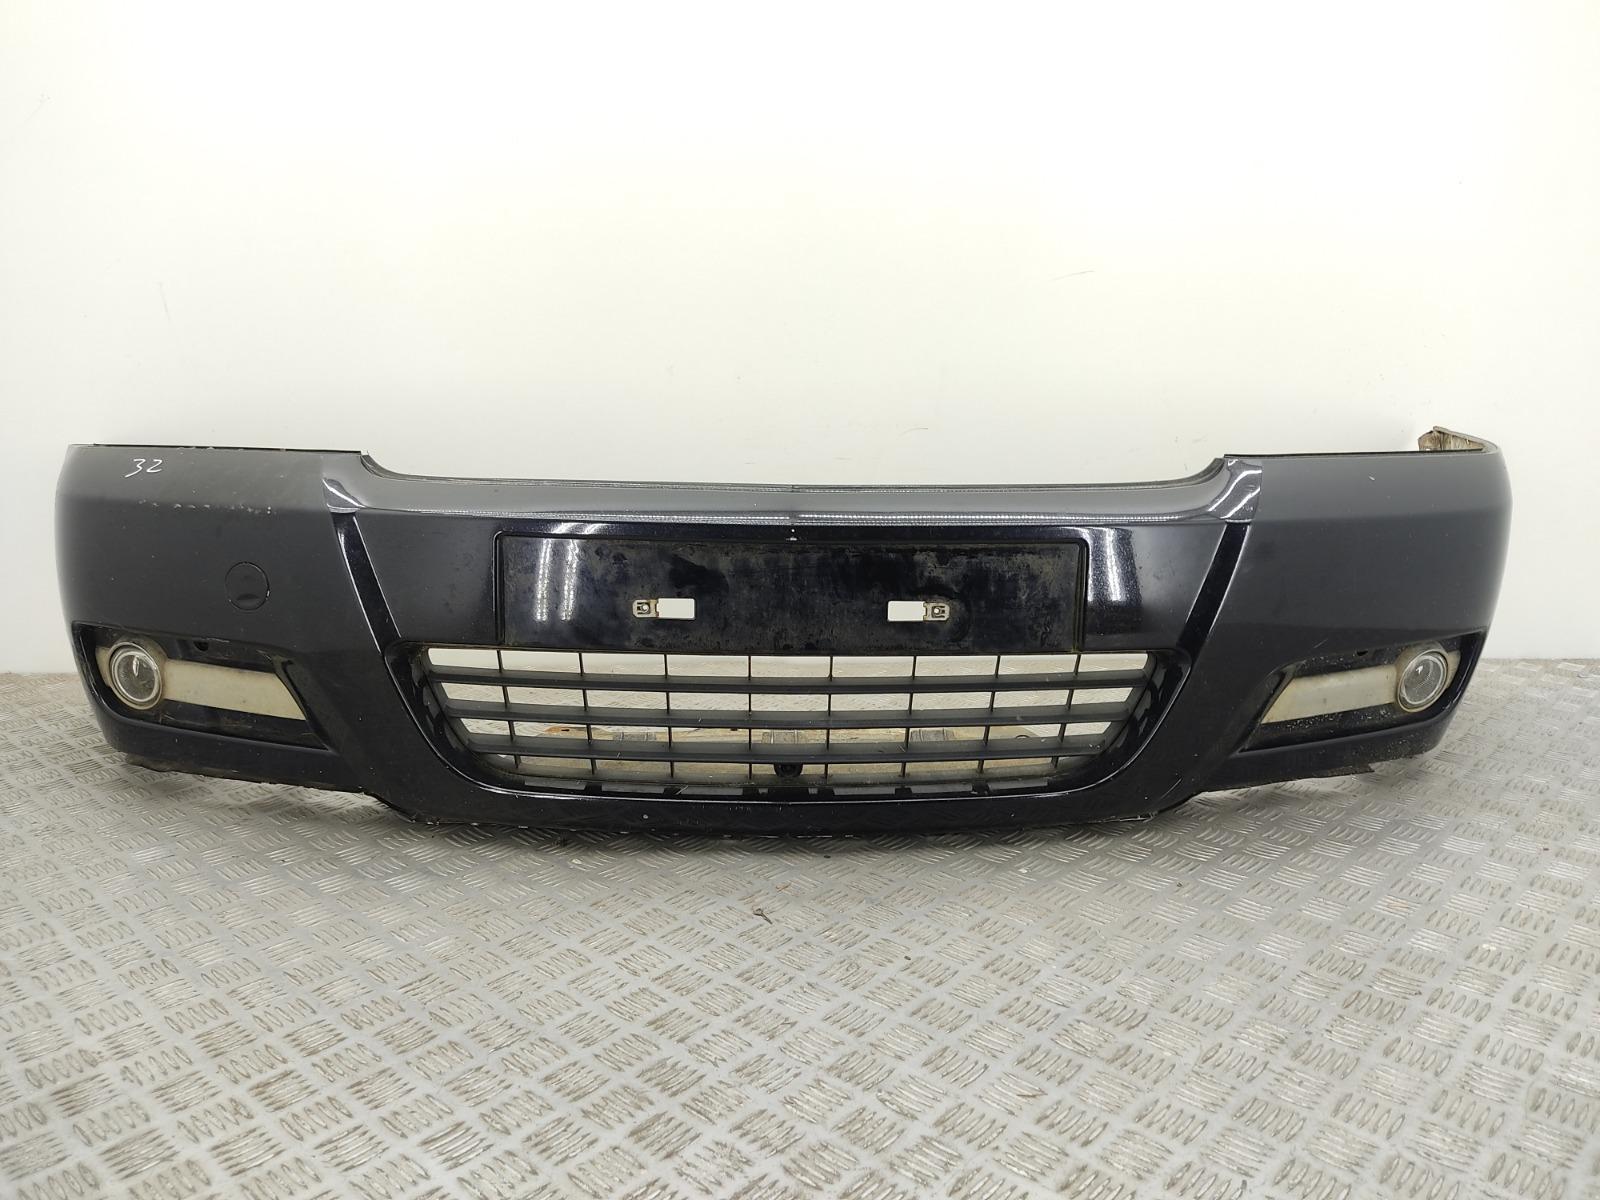 Бампер передний Opel Signum 3.0 CDTI 2003 (б/у)